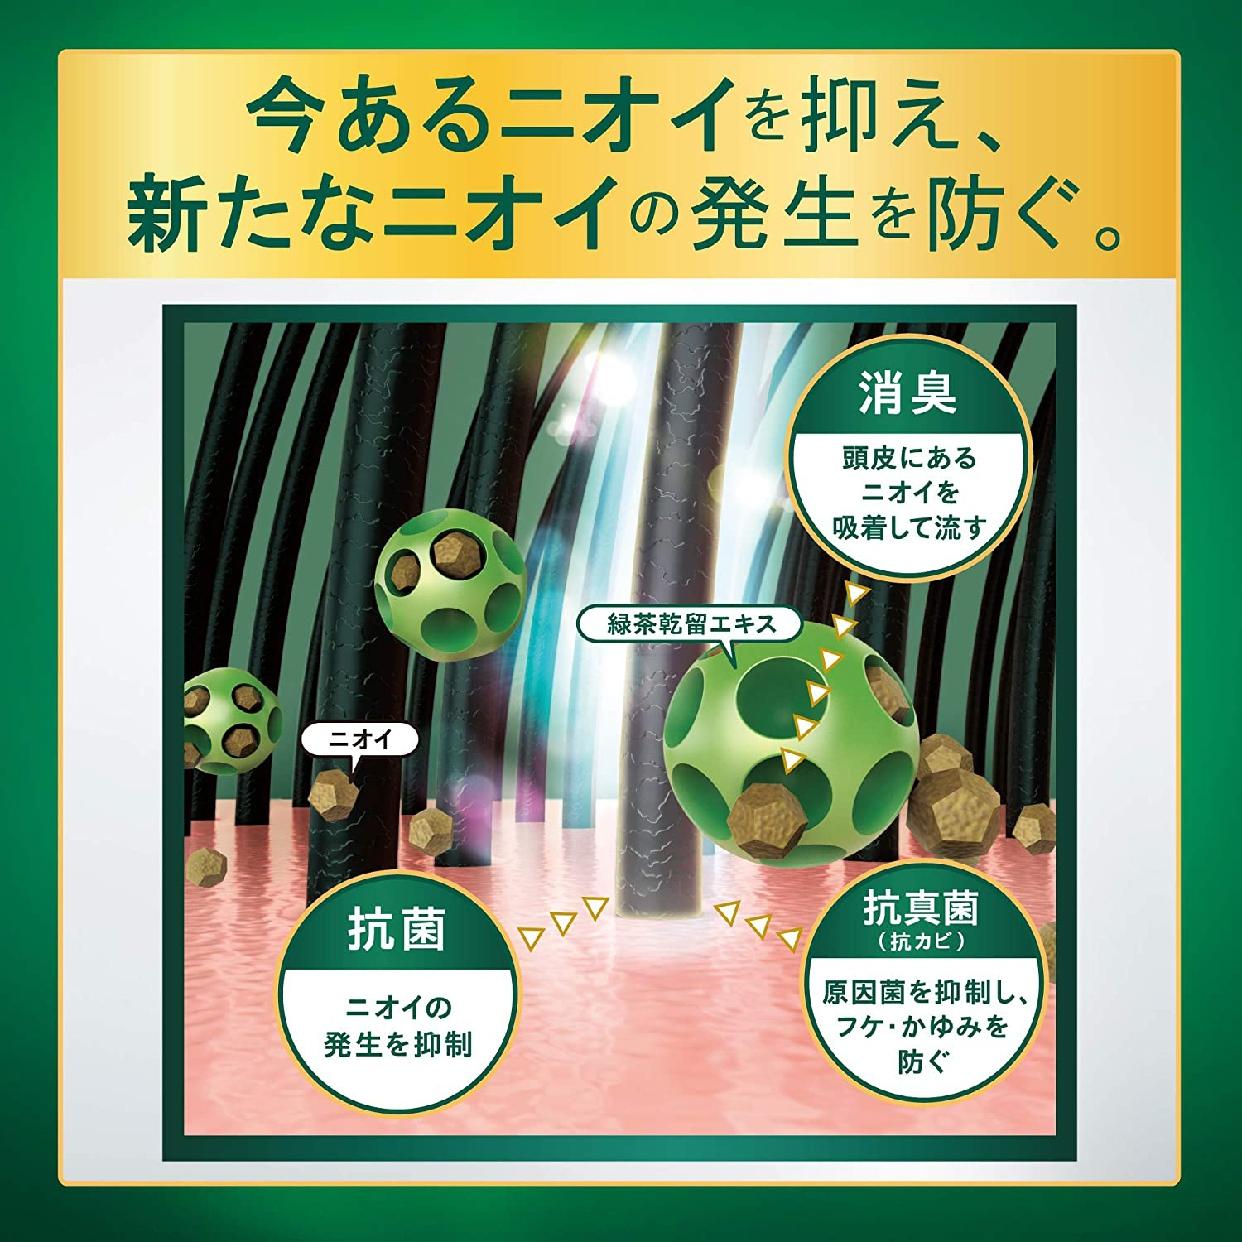 Collage(コラージュ)コラージュ フルフル プレミアムシャンプーの商品画像14